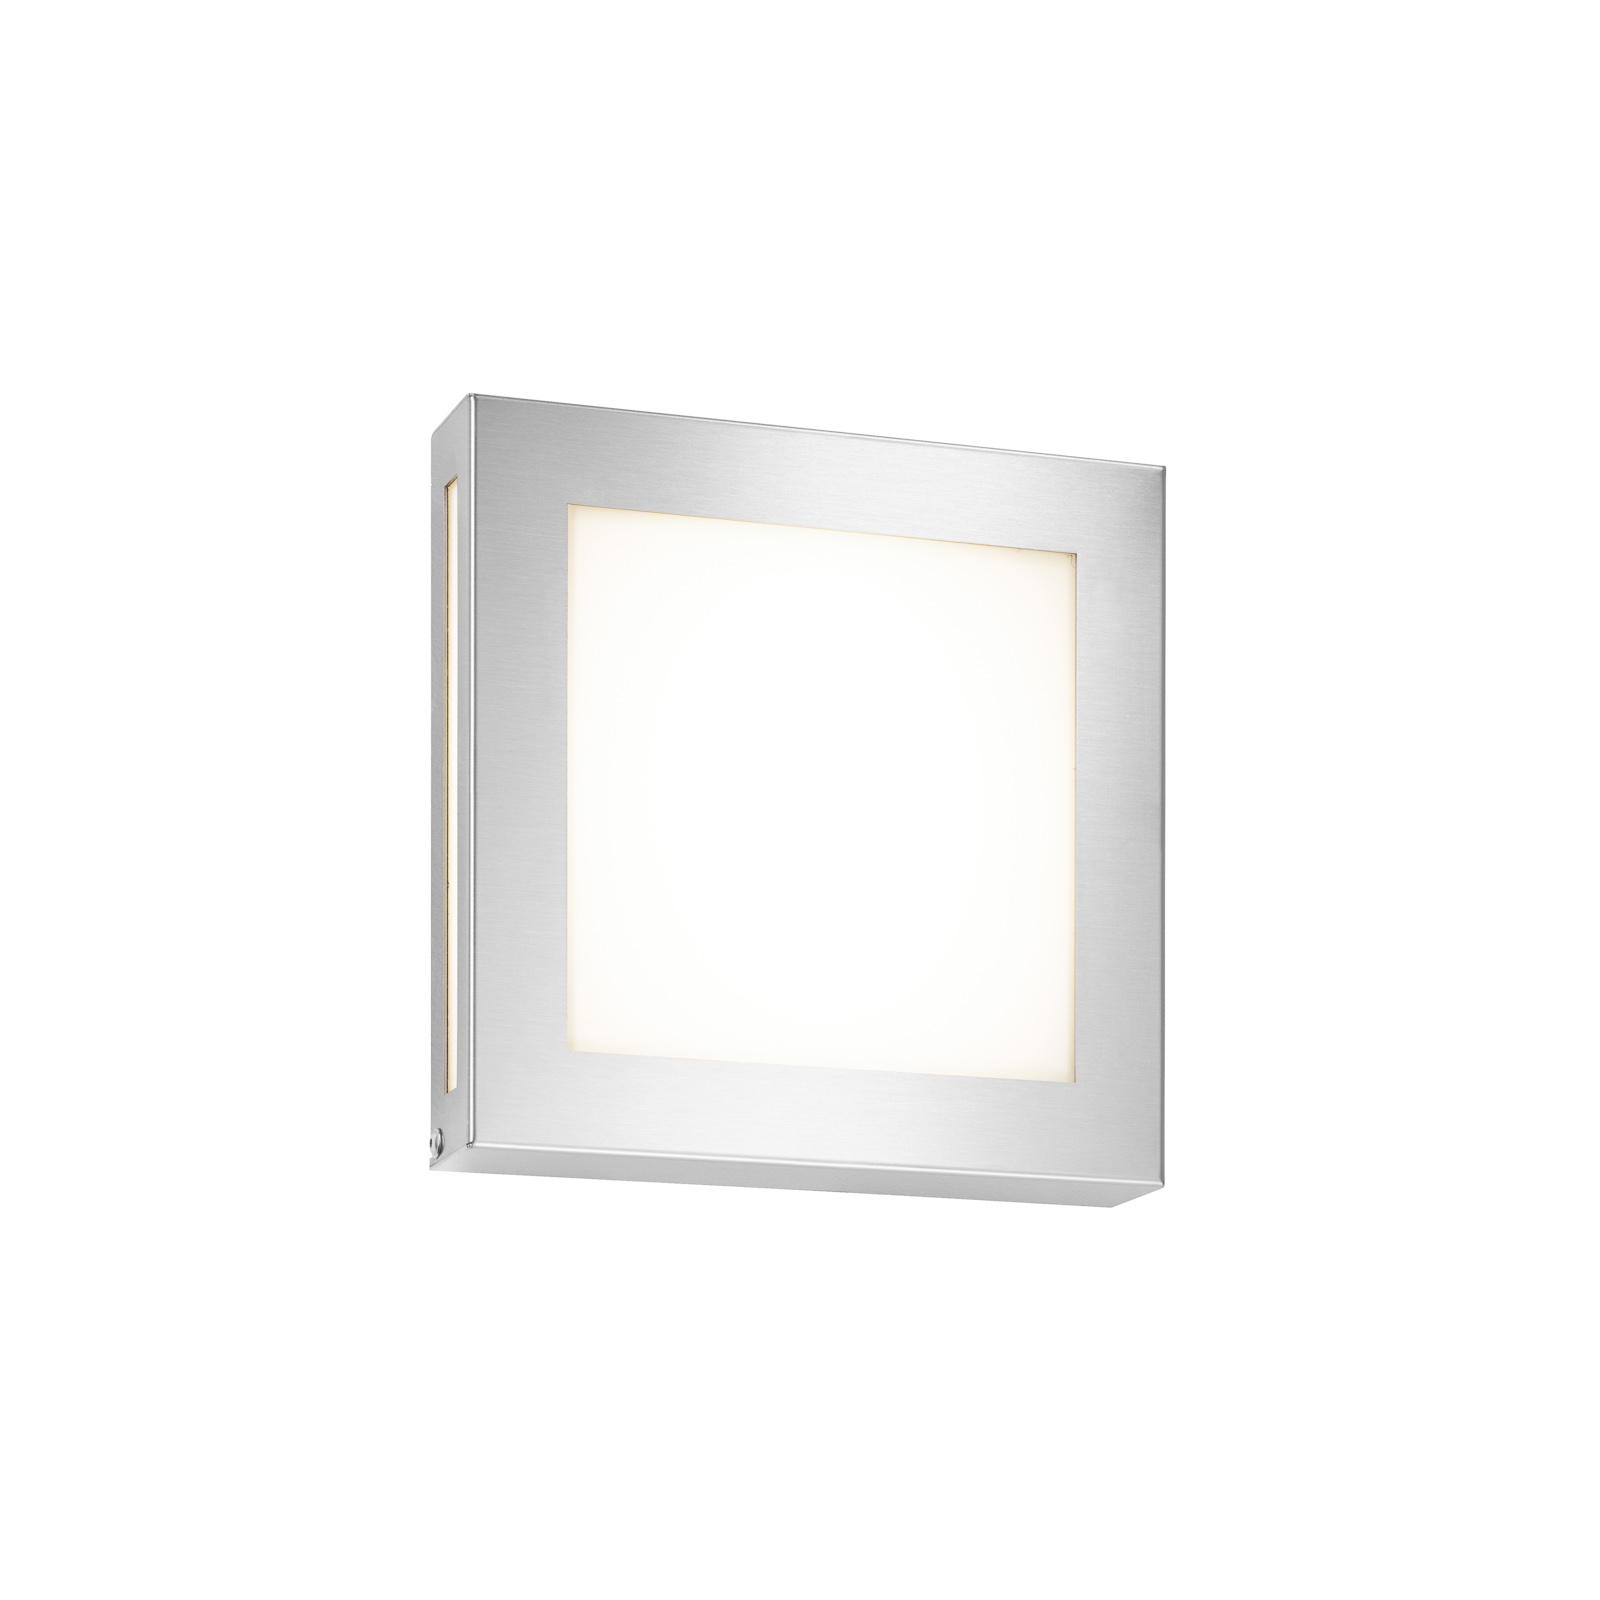 Lampada parete esterni Legendo Mini LED